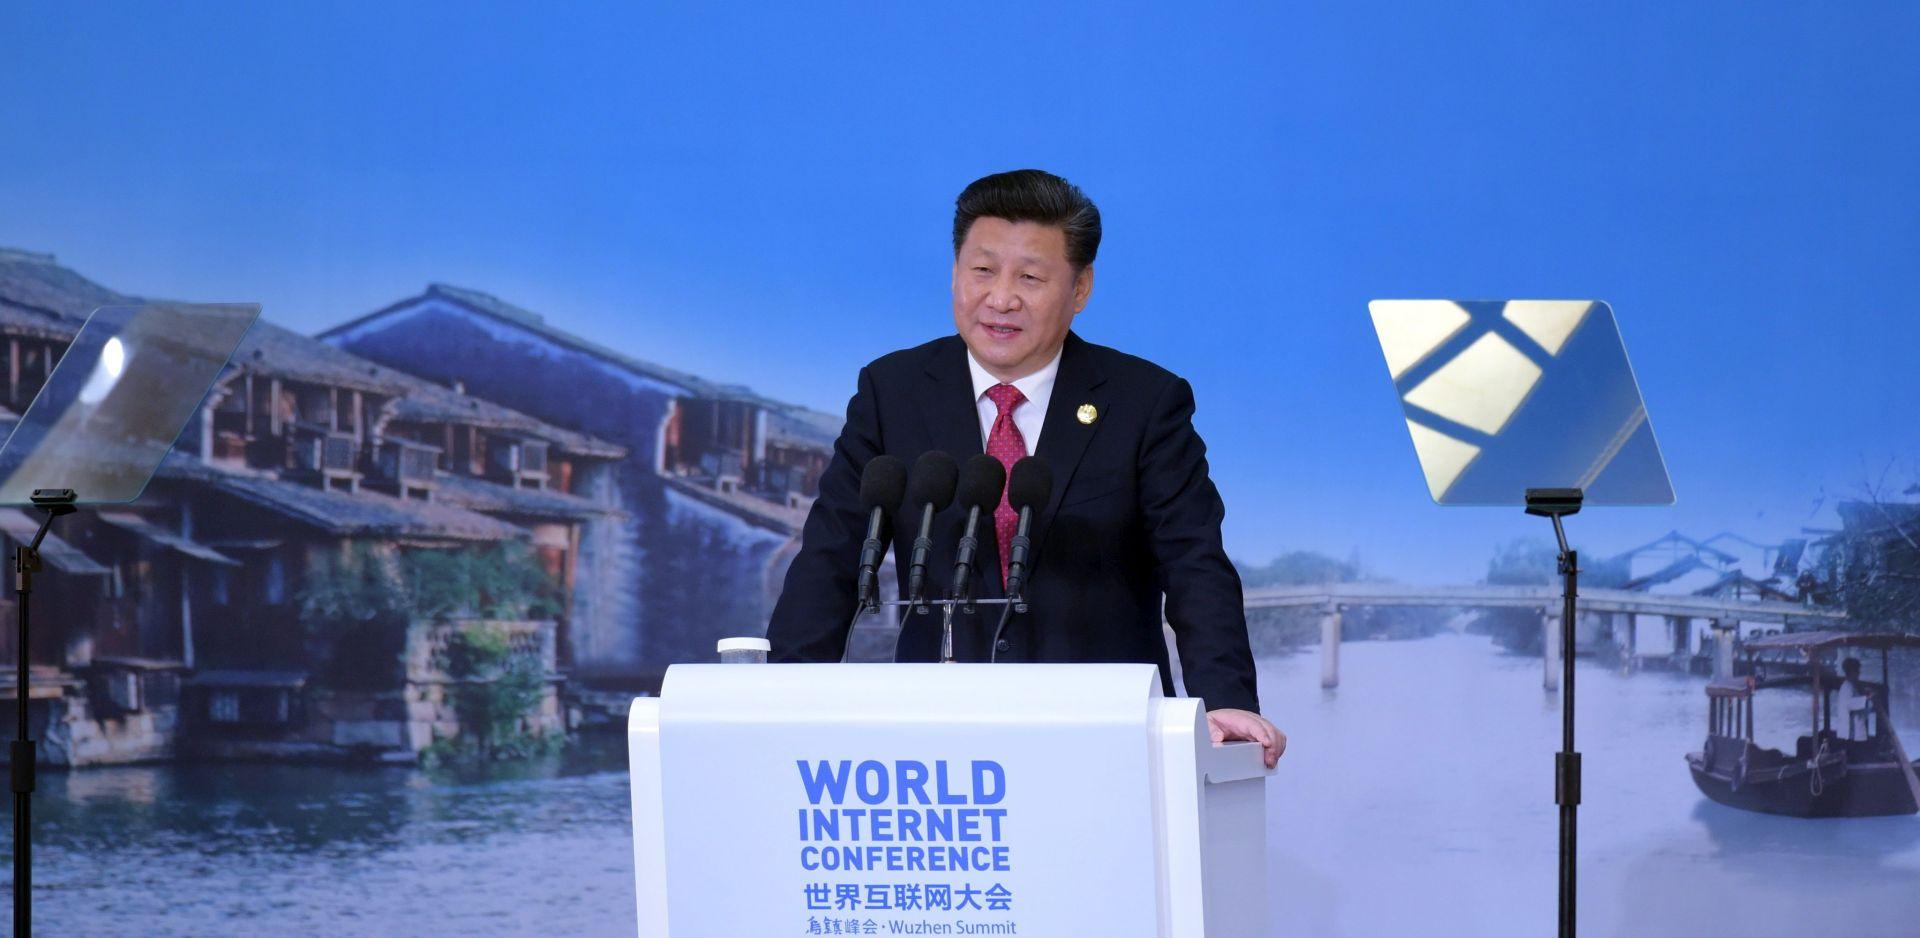 VIDEO: Xi Jinping nakon sastanka u Uzbekistanu svečano primio Vladimira Putina u Pekingu